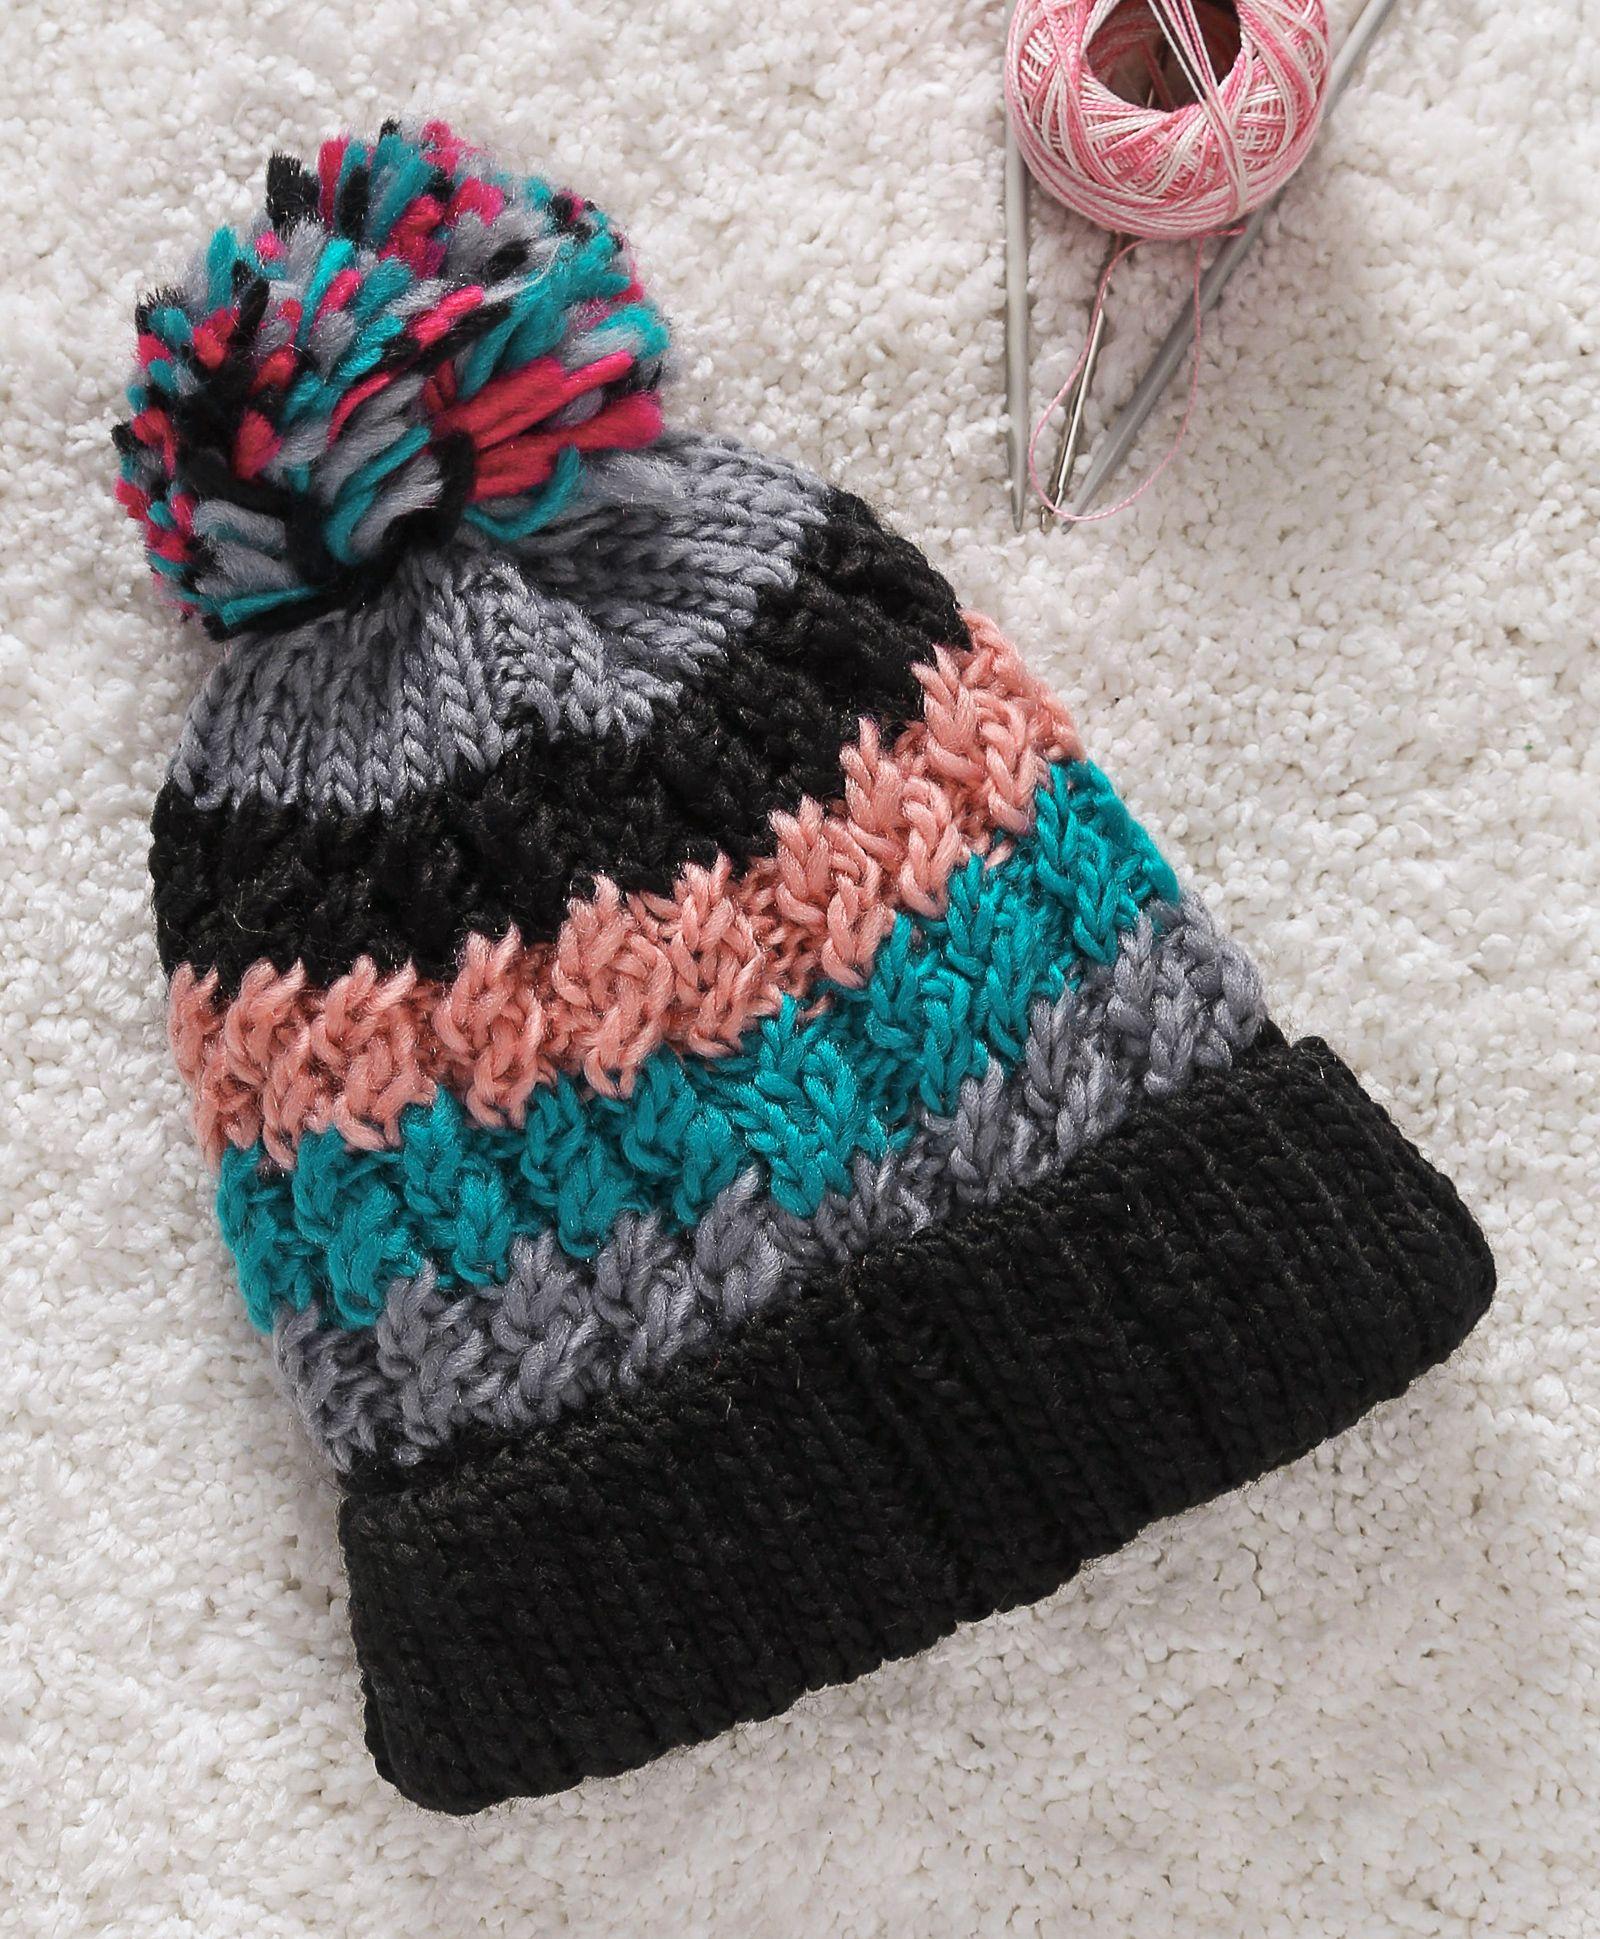 Babyhug Winter Wear Cap With Pom Pom Motif Black Online in India 5c1967a2da2